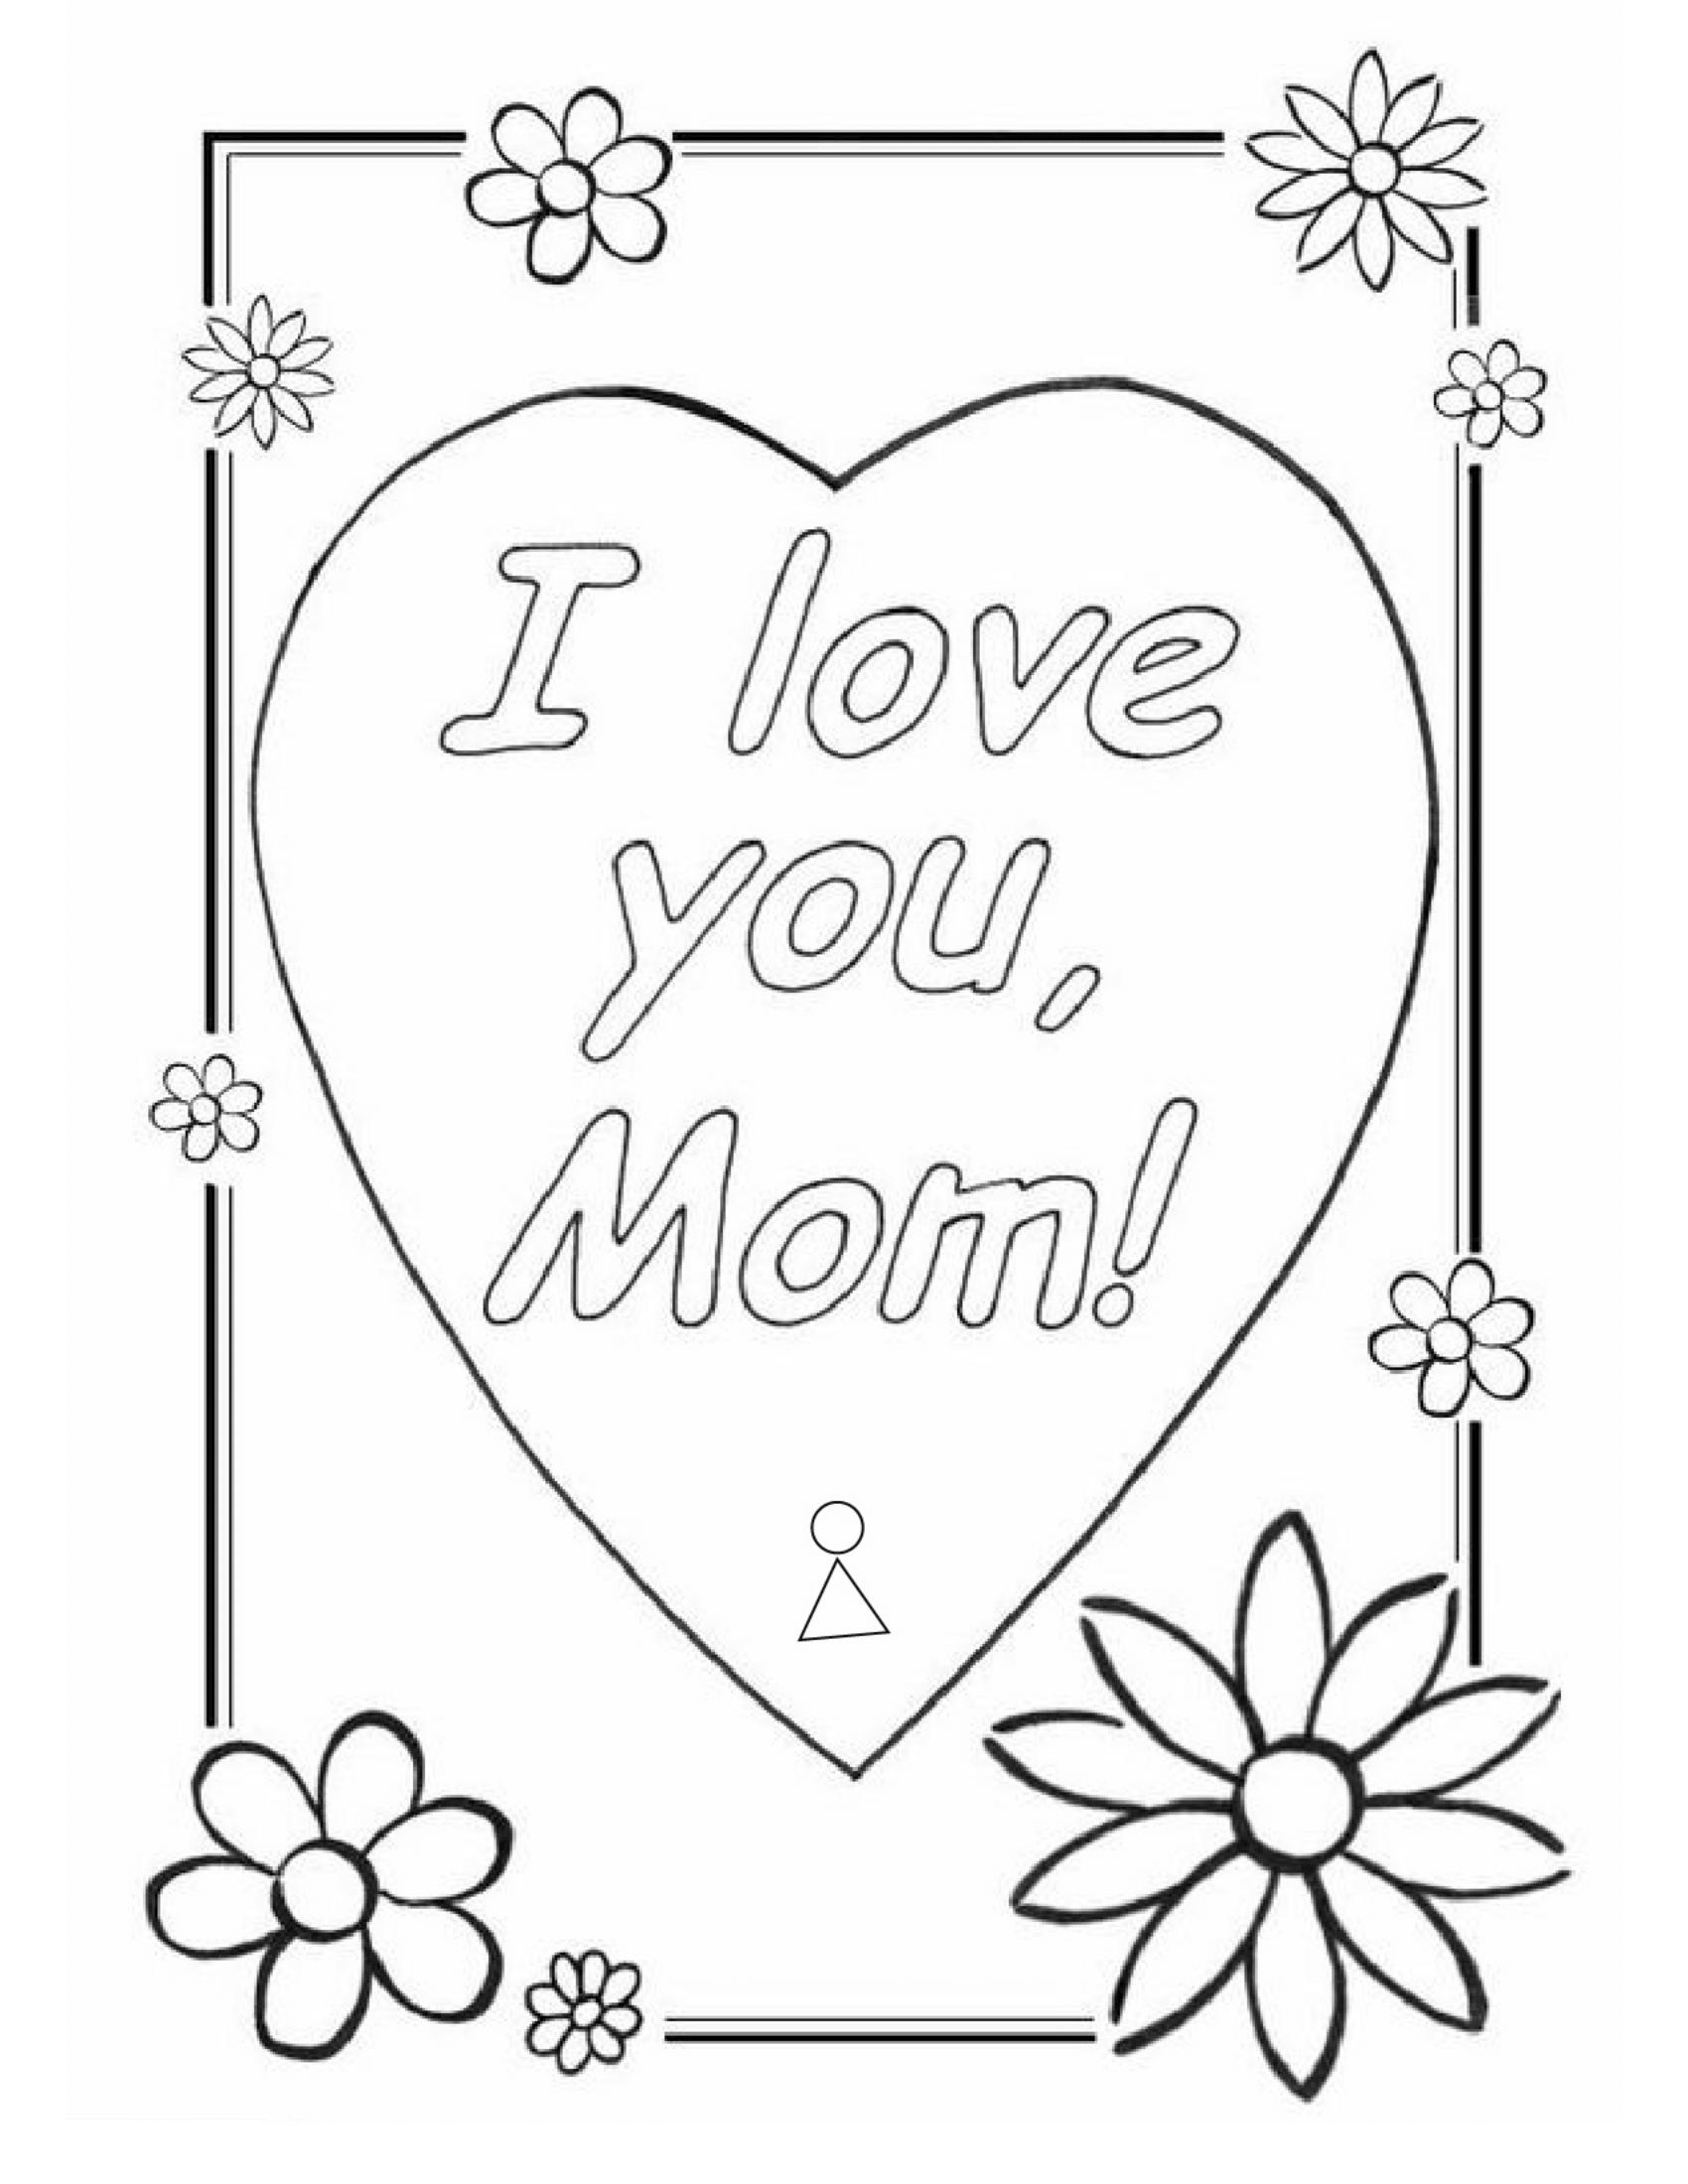 mom-color-sheet-PDF-1